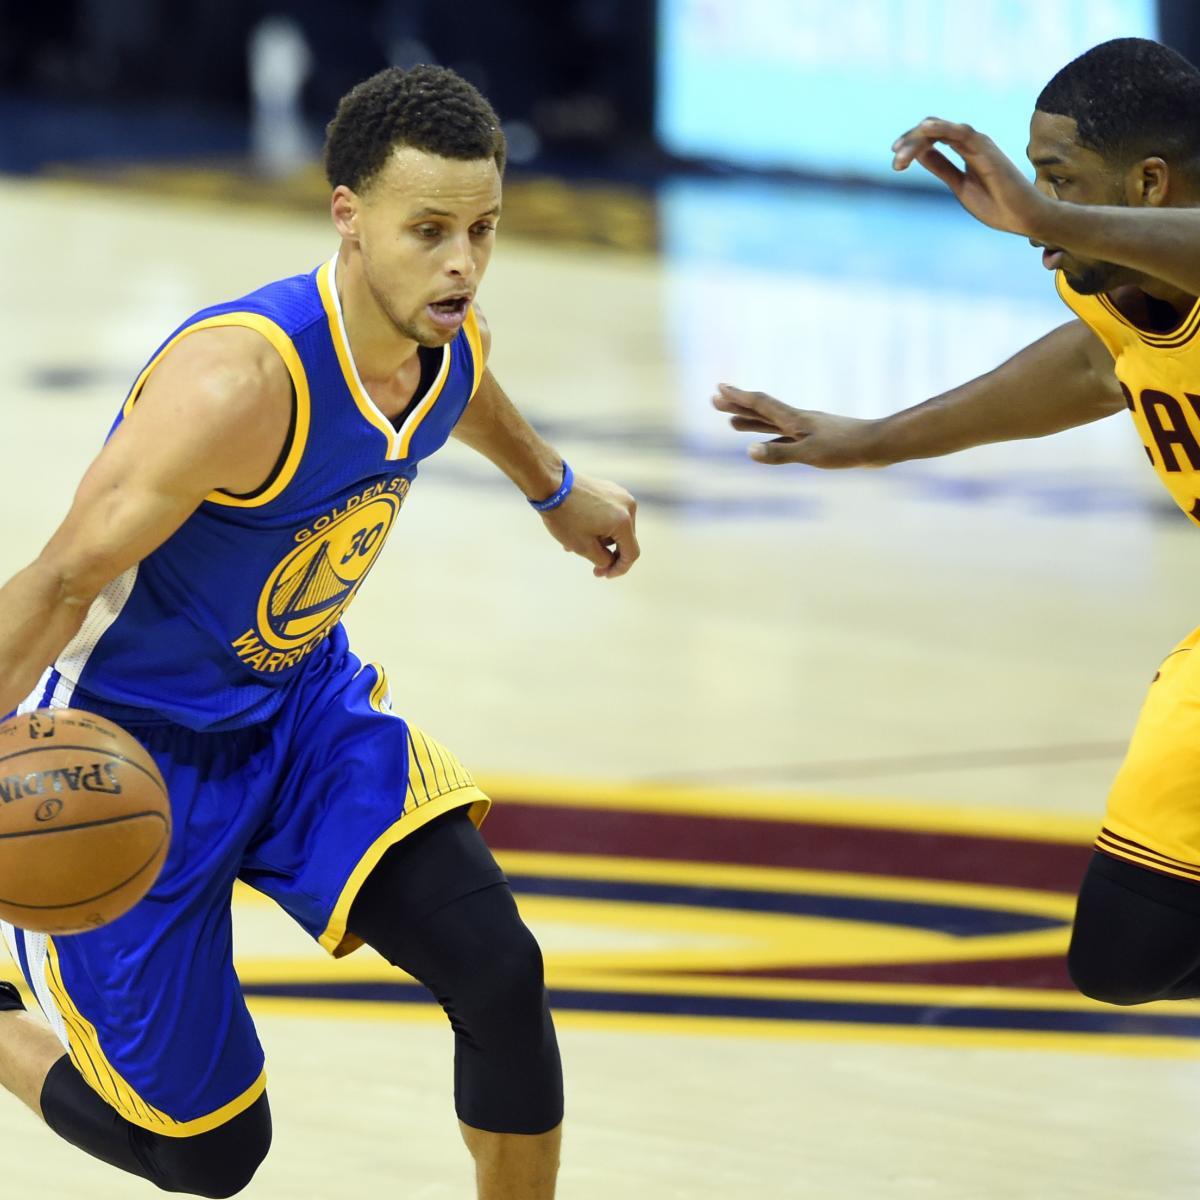 Warriors Game Broadcast Tv: Warriors Vs. Cavaliers: Game 4 Live Stream, ABC TV